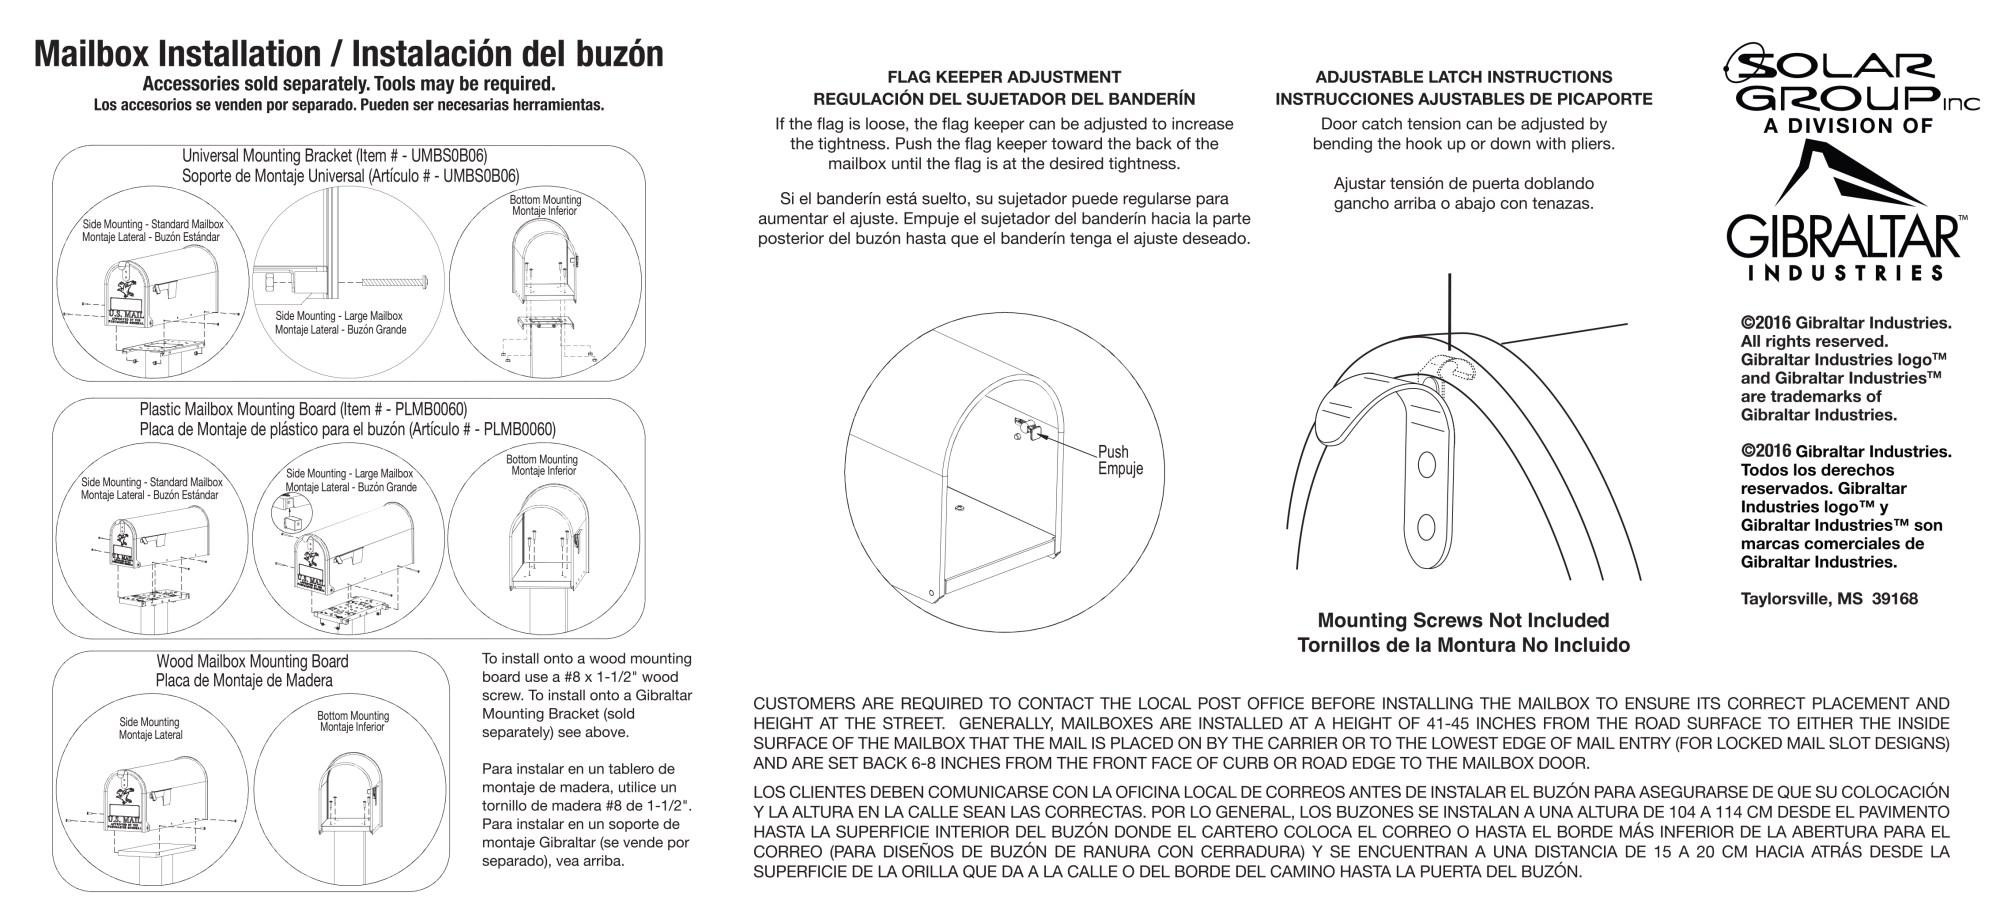 hight resolution of arlington post mount ar15 series brunswick post mount bm16 series cedar post mount cc1r and cc2r series classic post mount c11 and c16 series